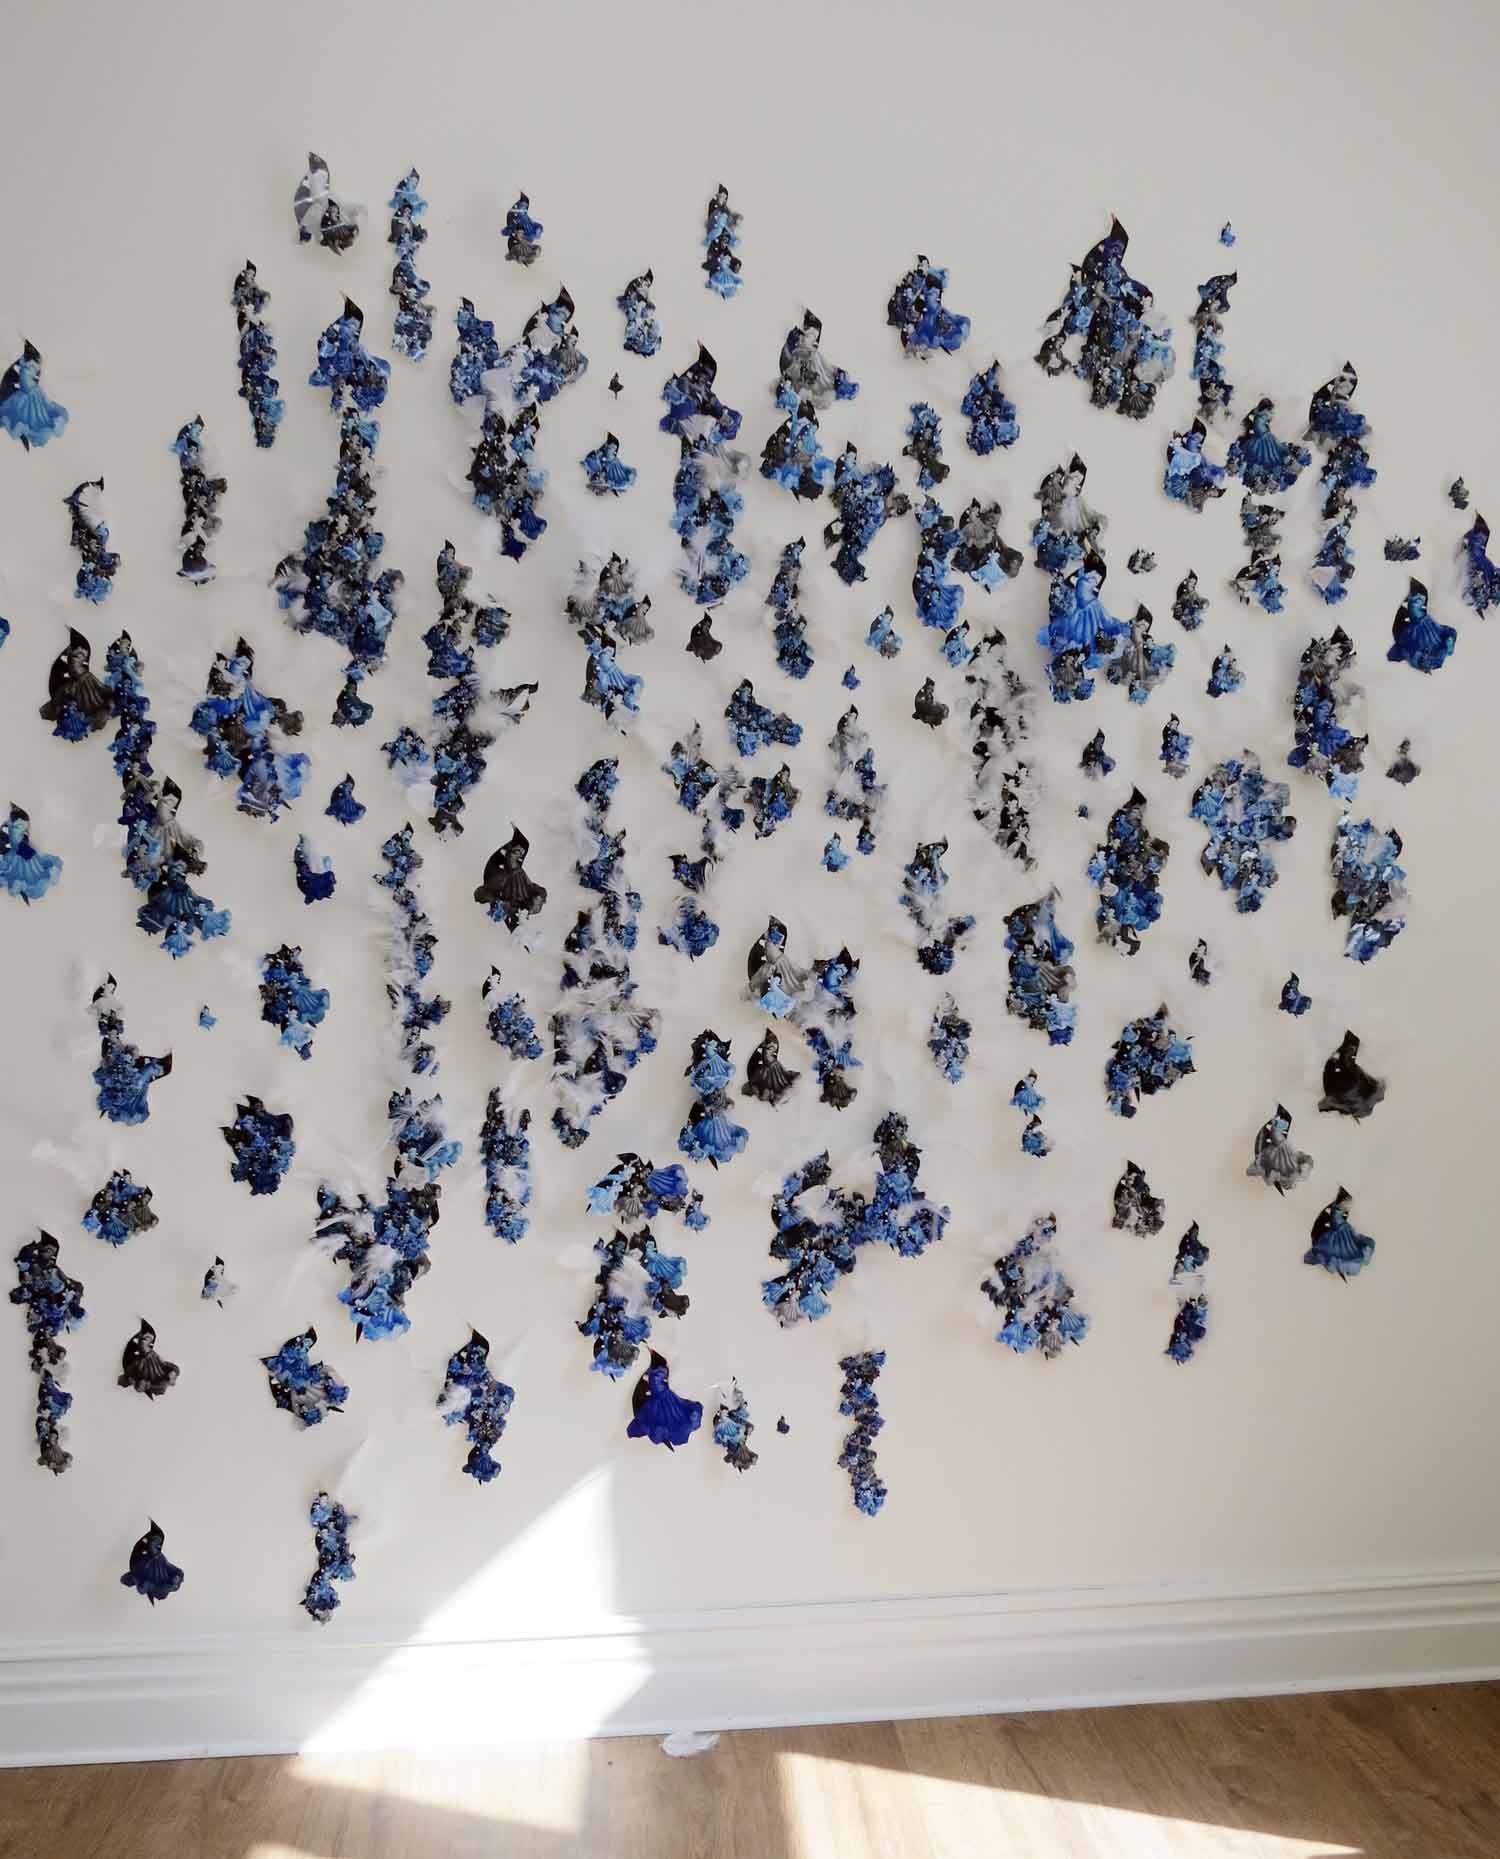 BLUE OCEAN (wall piece)